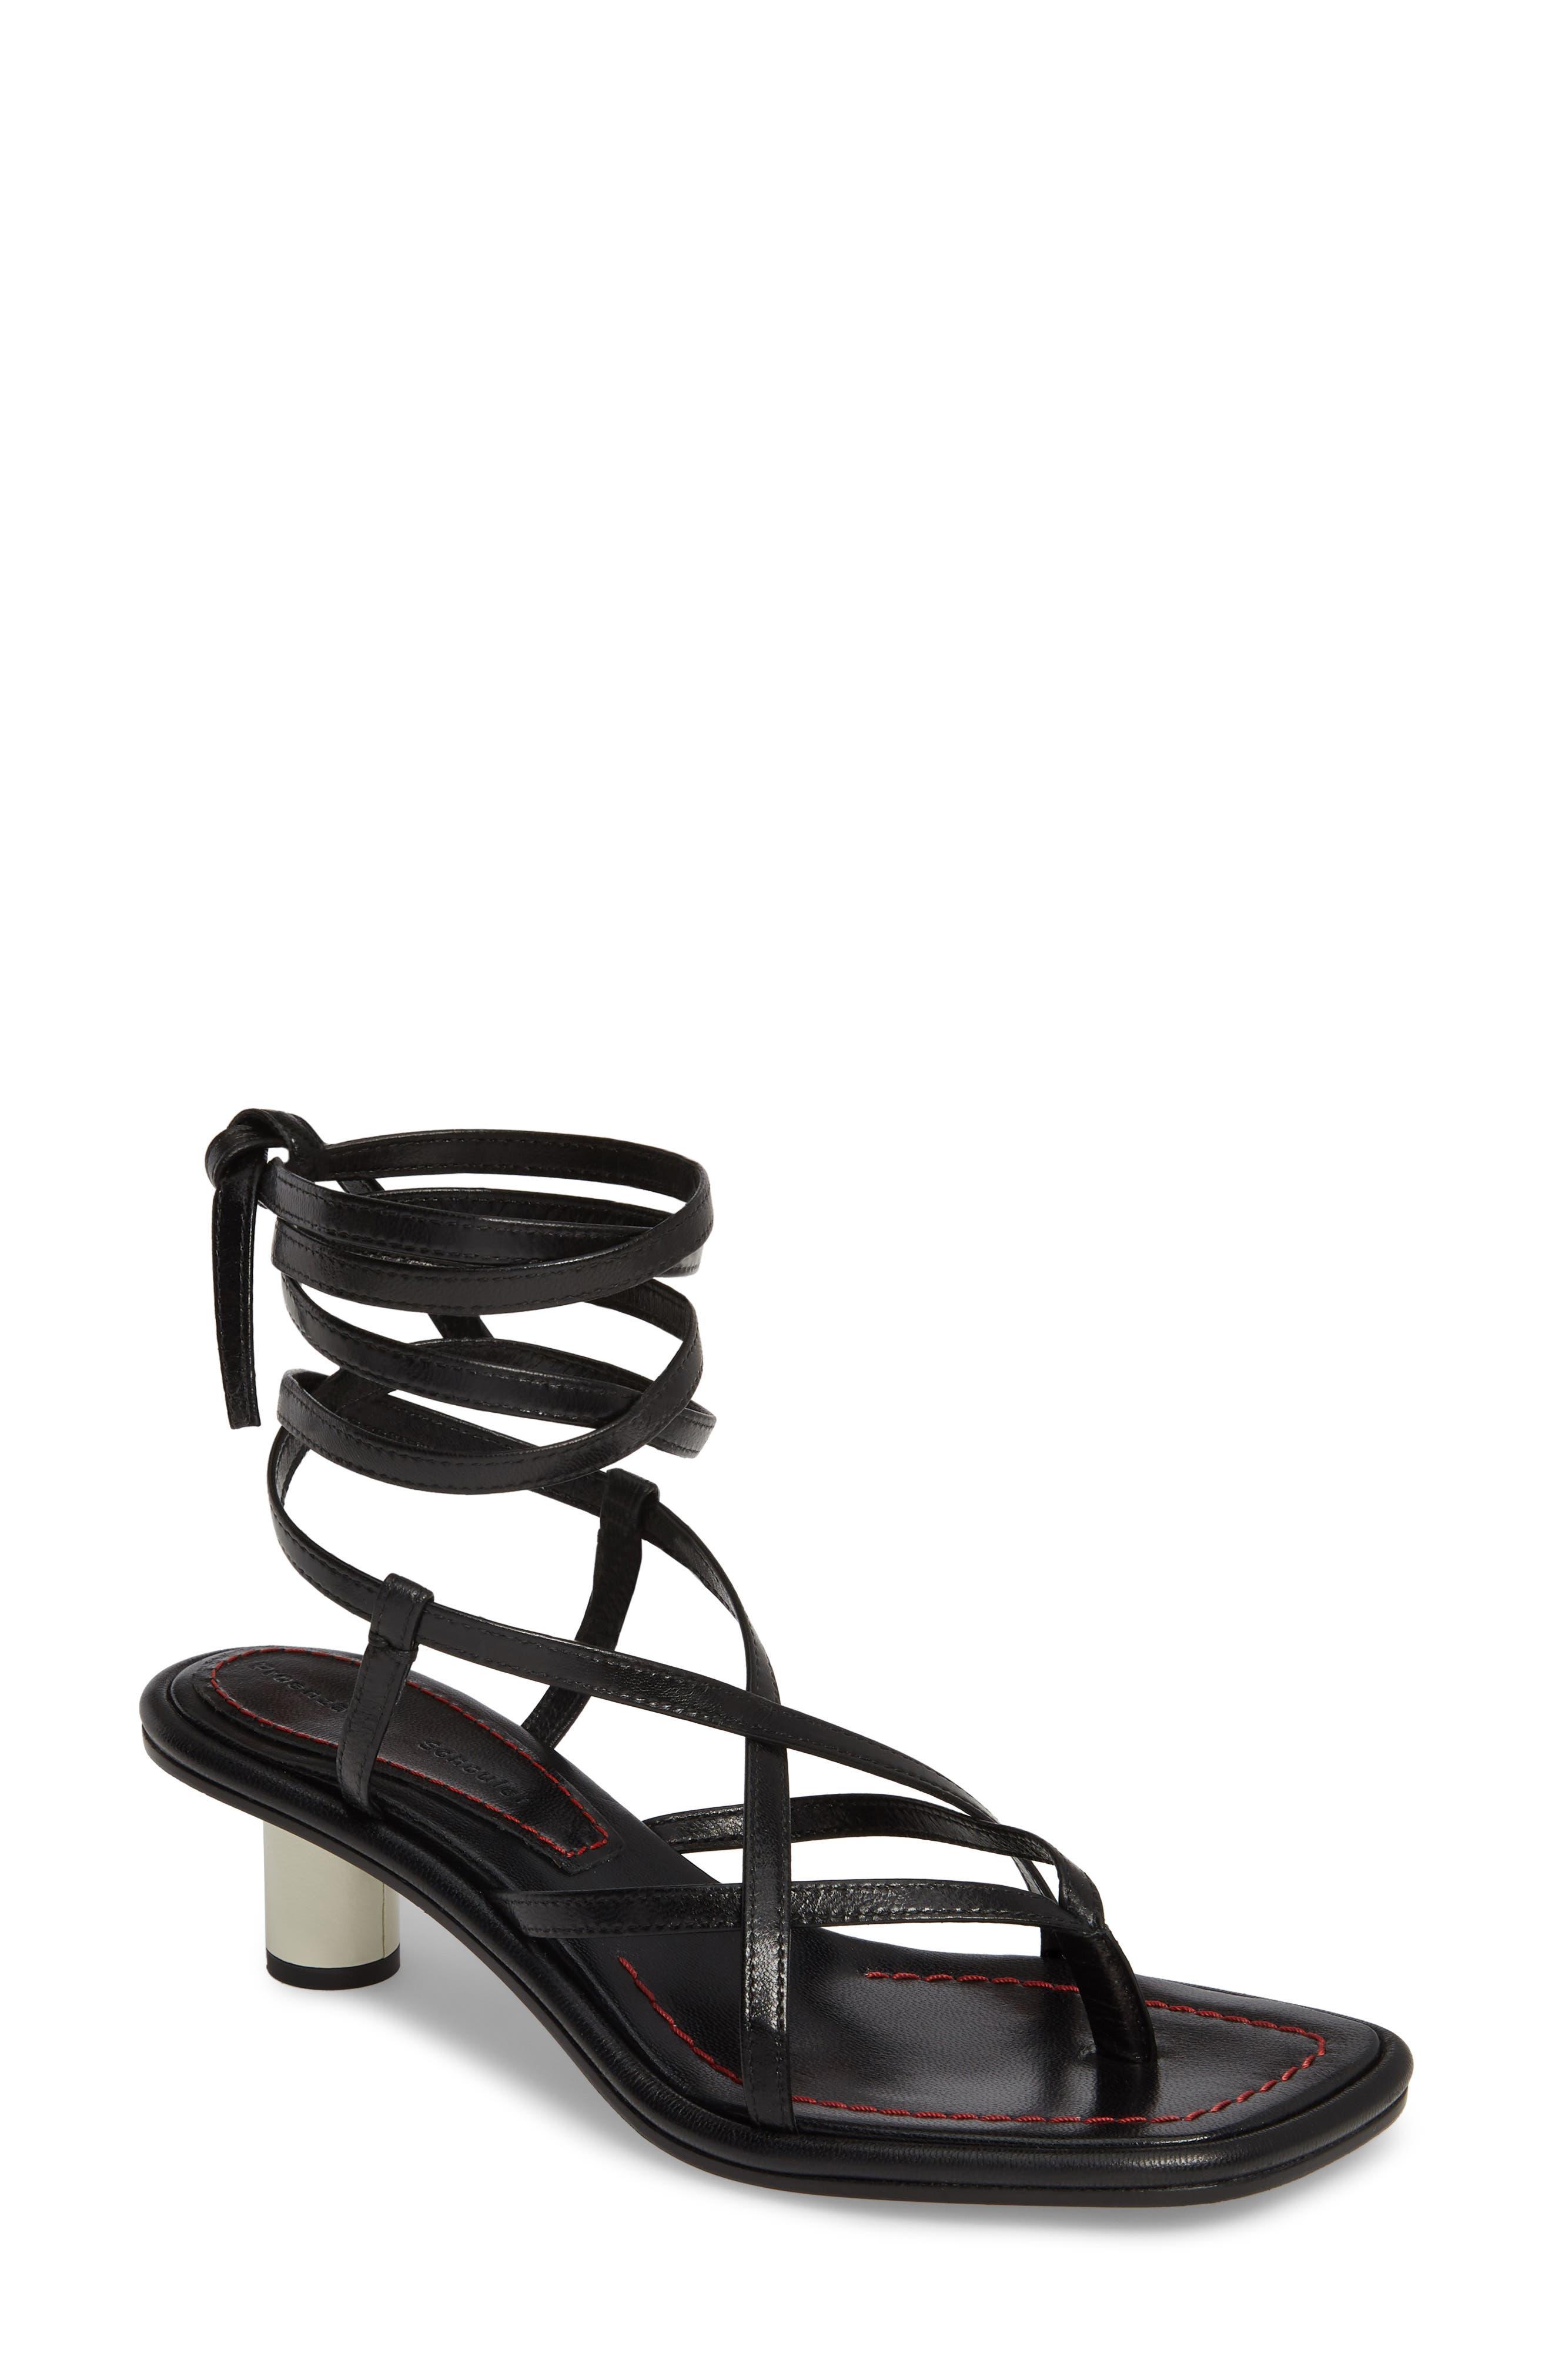 PROENZA SCHOULER, Wraparound Ankle Strap Sandal, Main thumbnail 1, color, BLACK